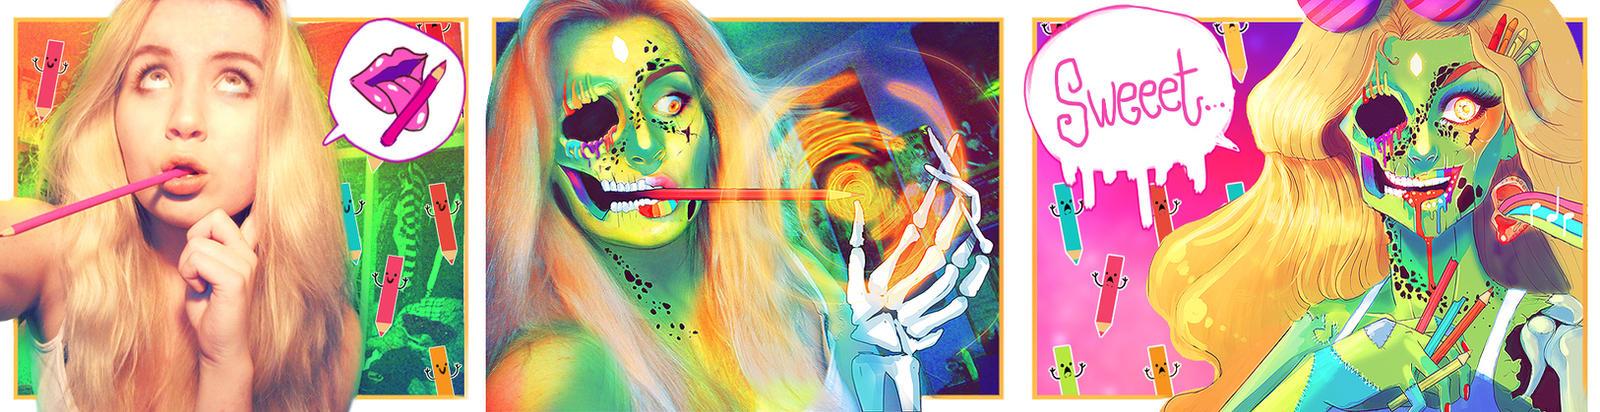 Art Zombie! by Demachic